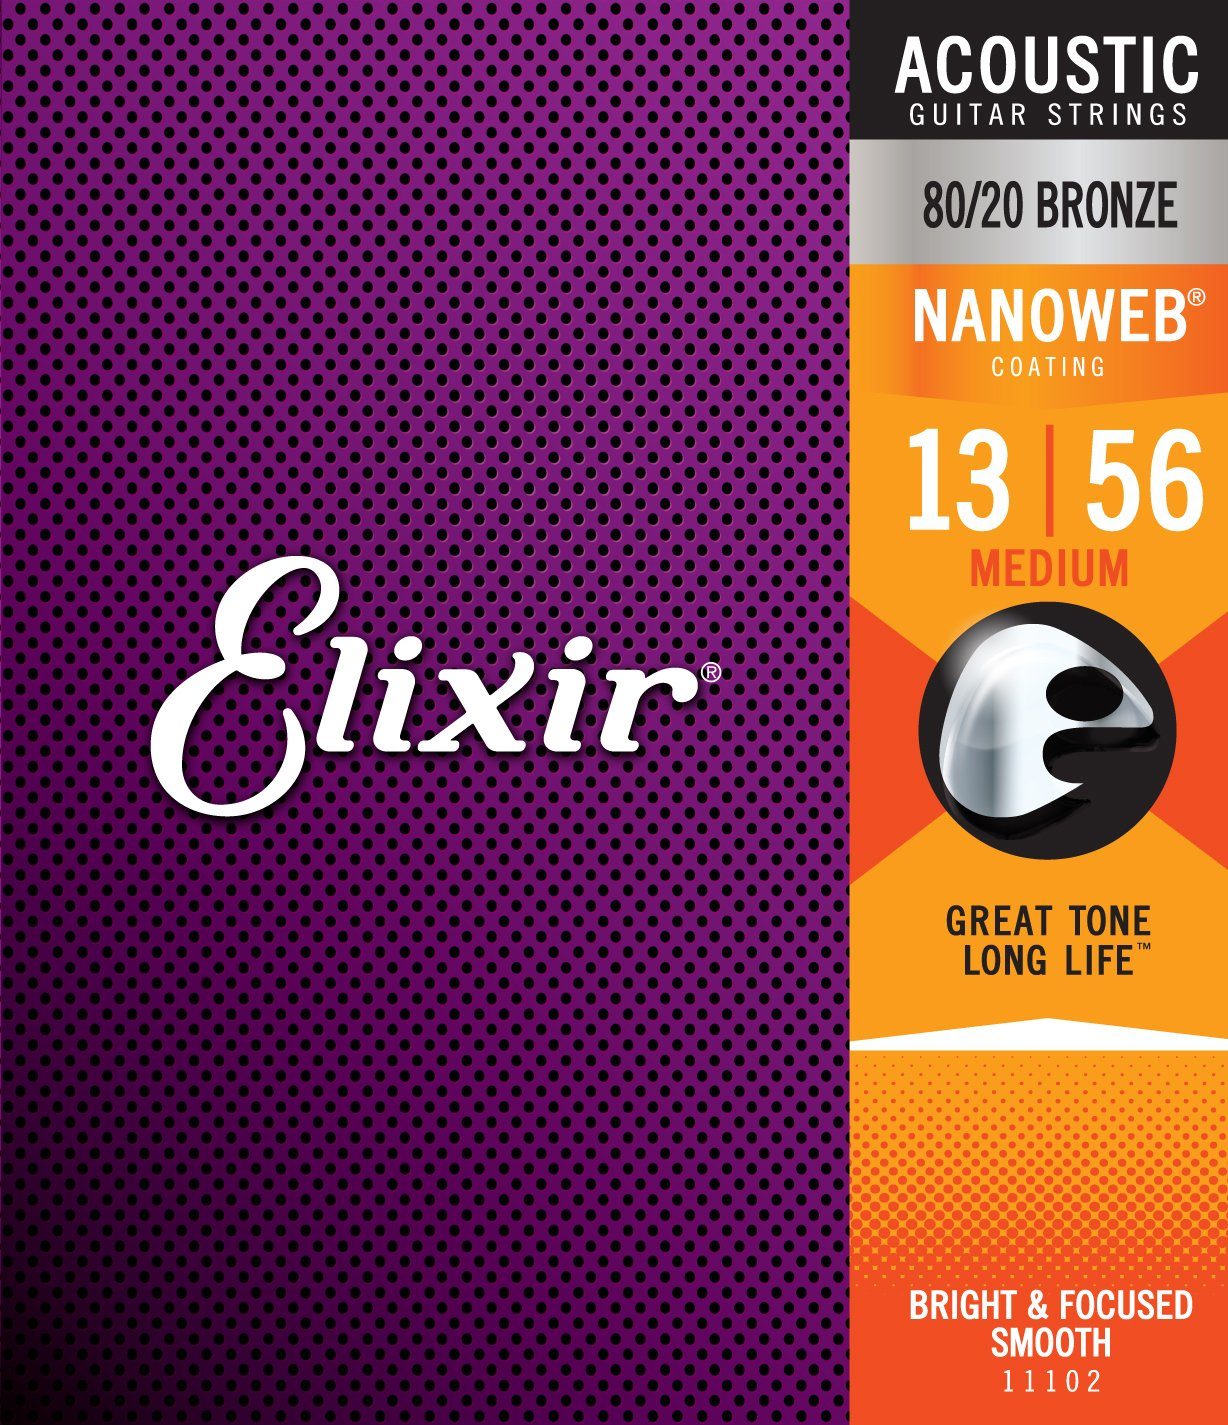 Elixir 80/20 Bronze 11102 Acoustic Guitar Strings, NANOWEB, Medium, 13-56